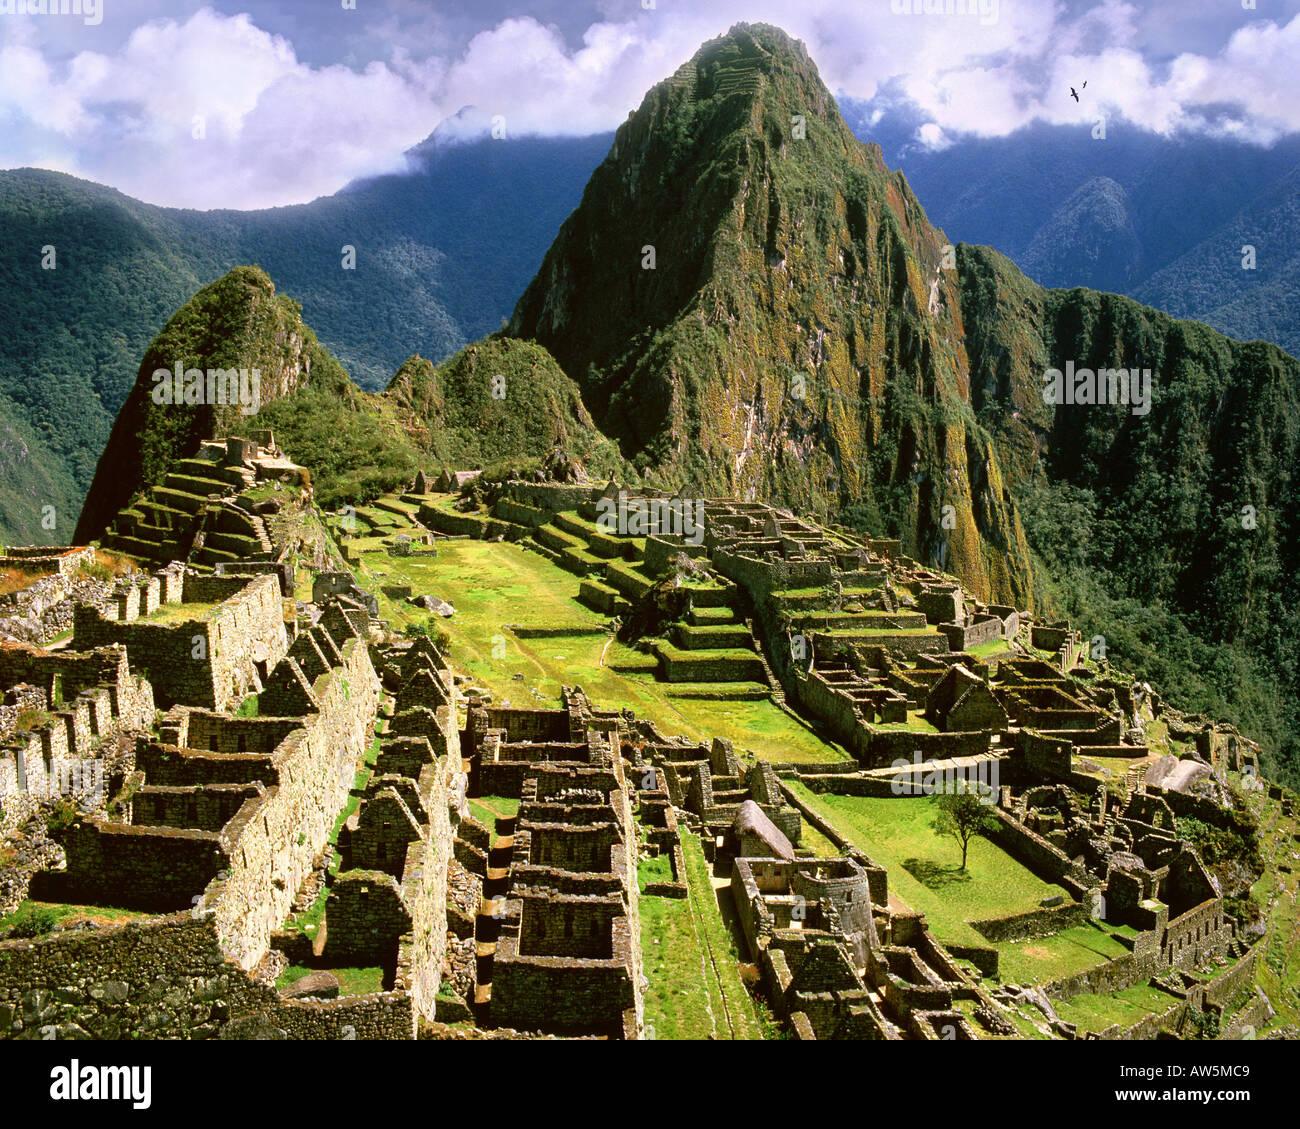 PE - CUZCO: Machu Picchu, die alte Inkastadt in den Anden Stockfoto